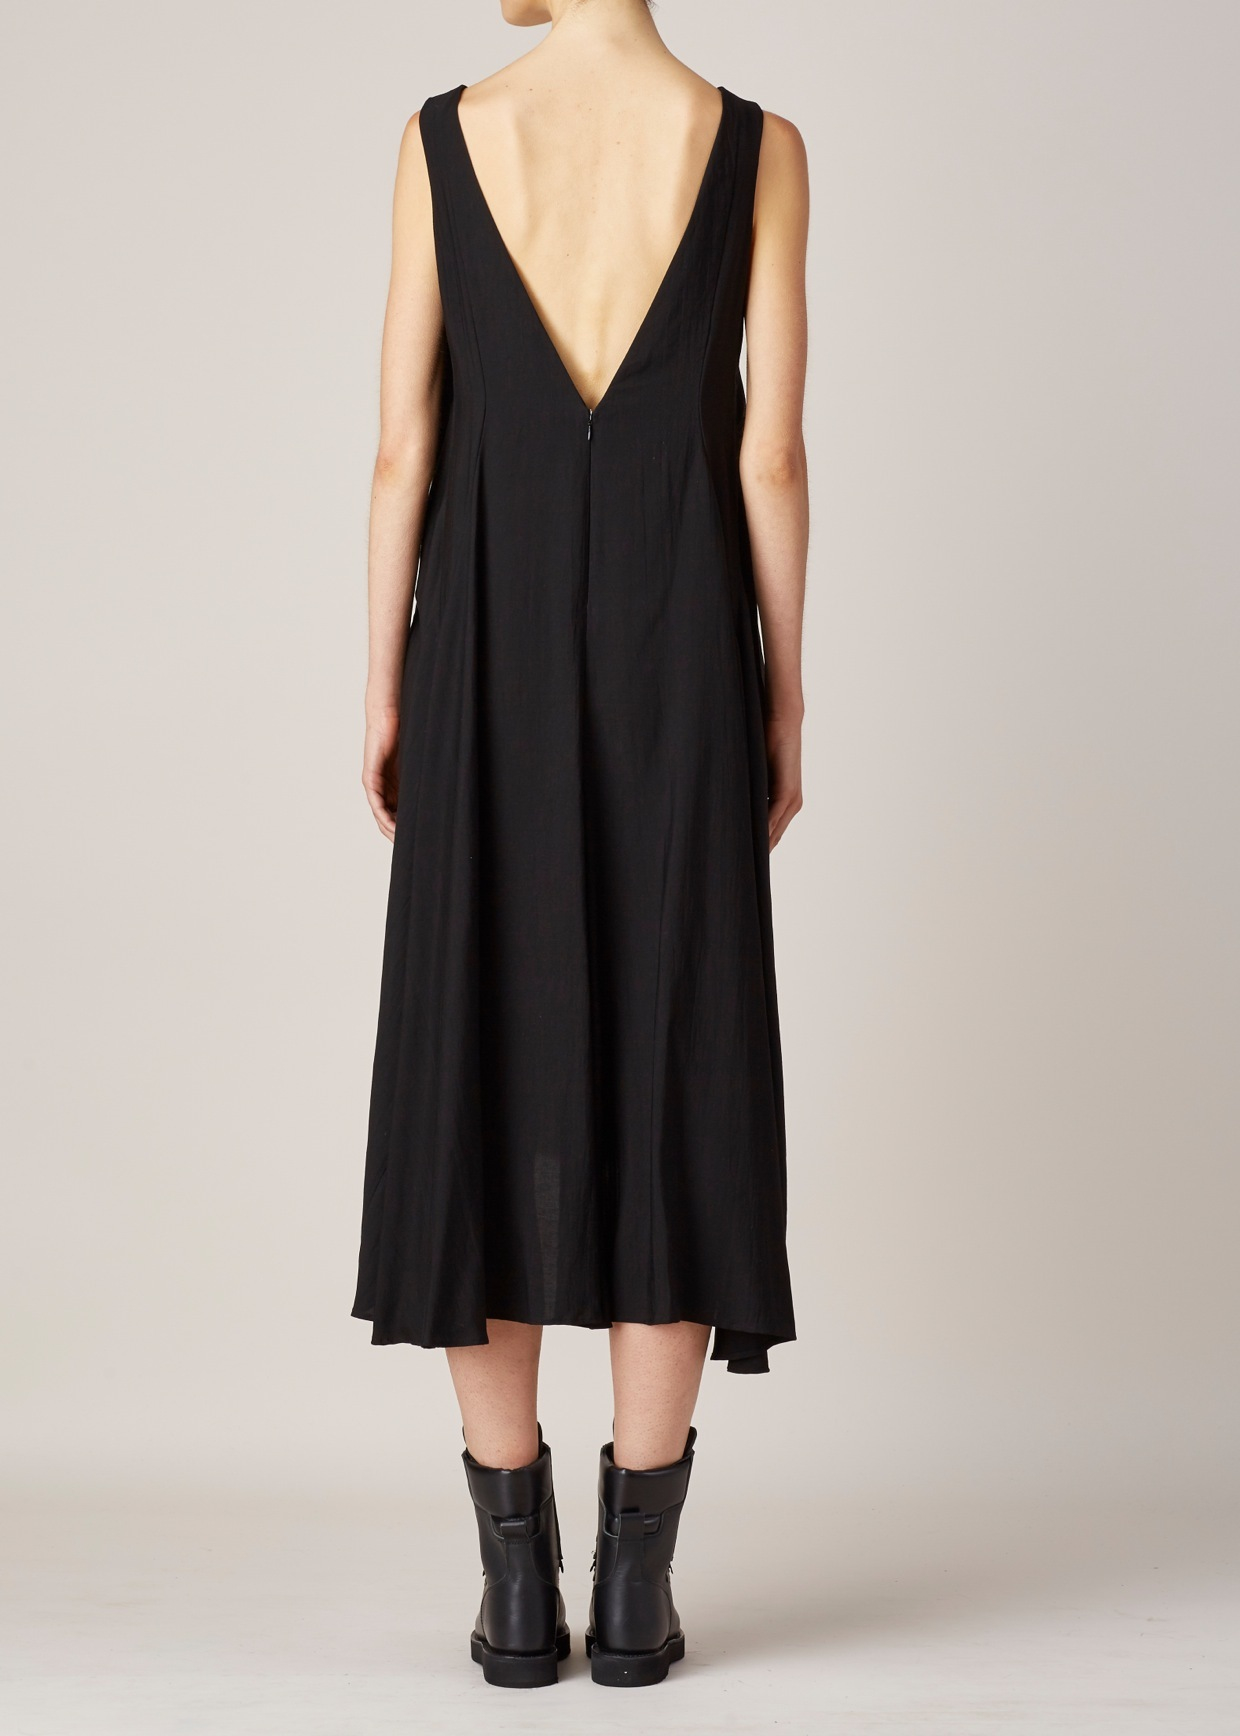 DRESSES - Short dresses Yohji Yamamoto jb0Jgt8